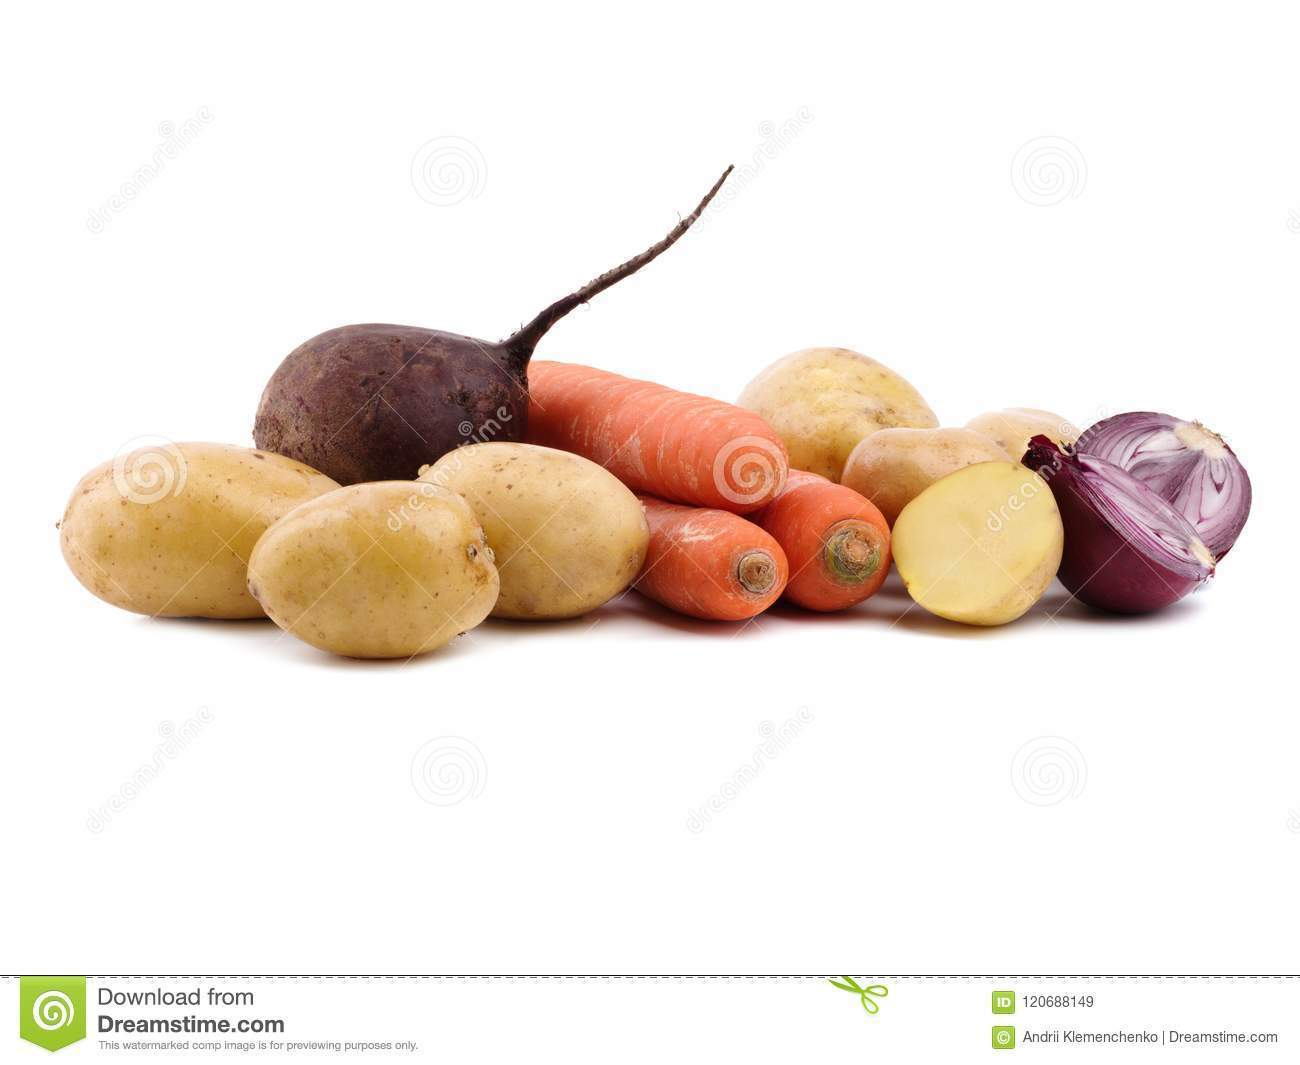 beet garten das beste von a set of garden ve ables stock image image of farm of beet garten